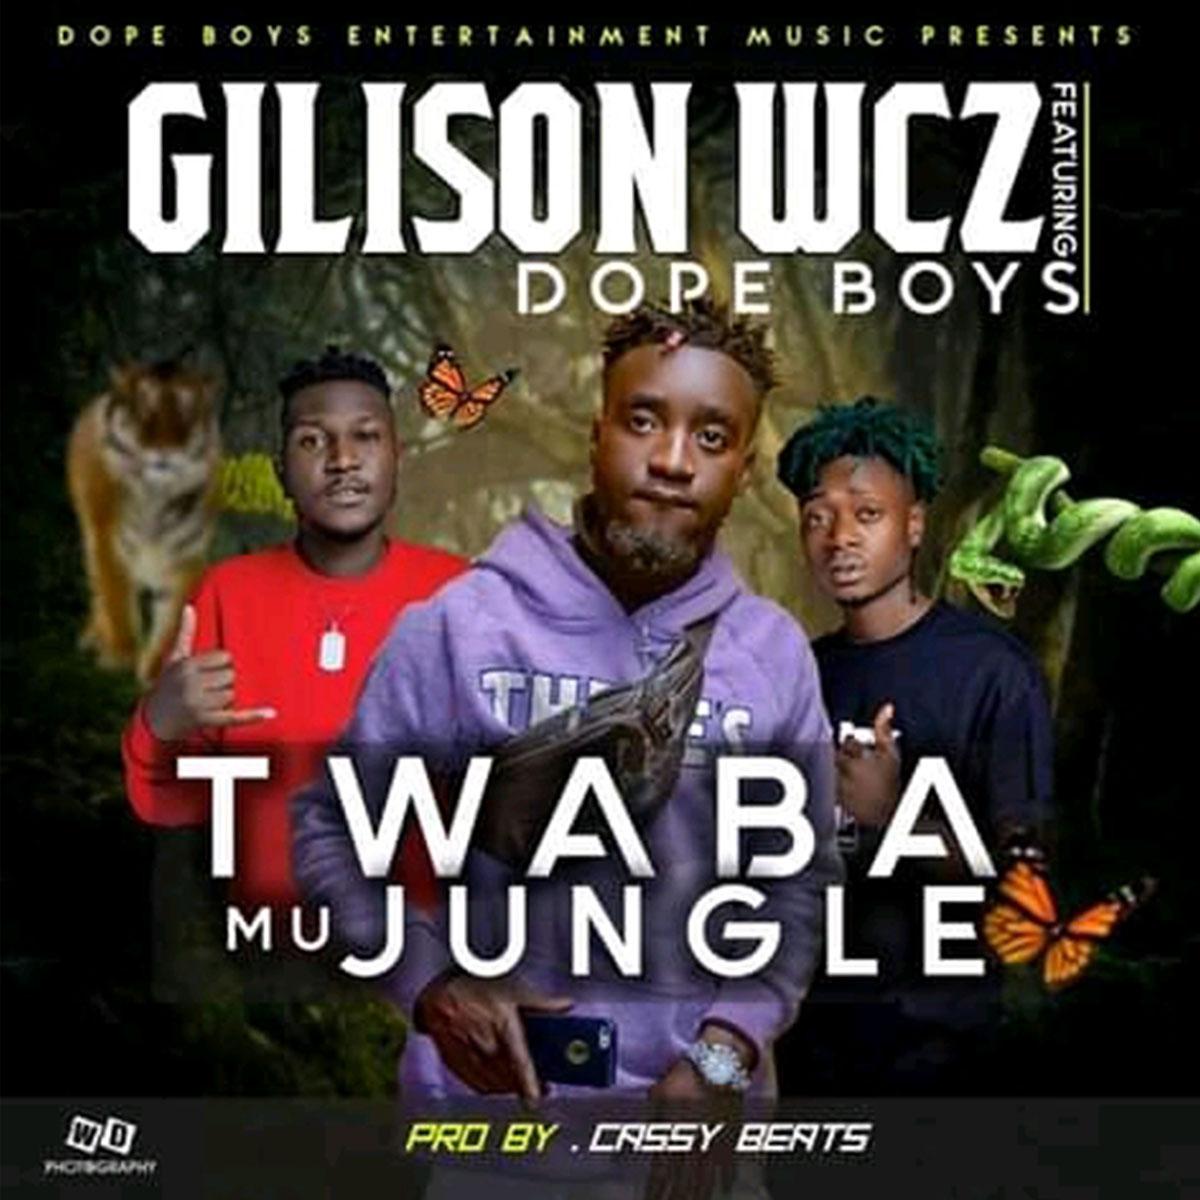 Gilison WCZ ft. Dope Boys - Twaba Mu Jungle